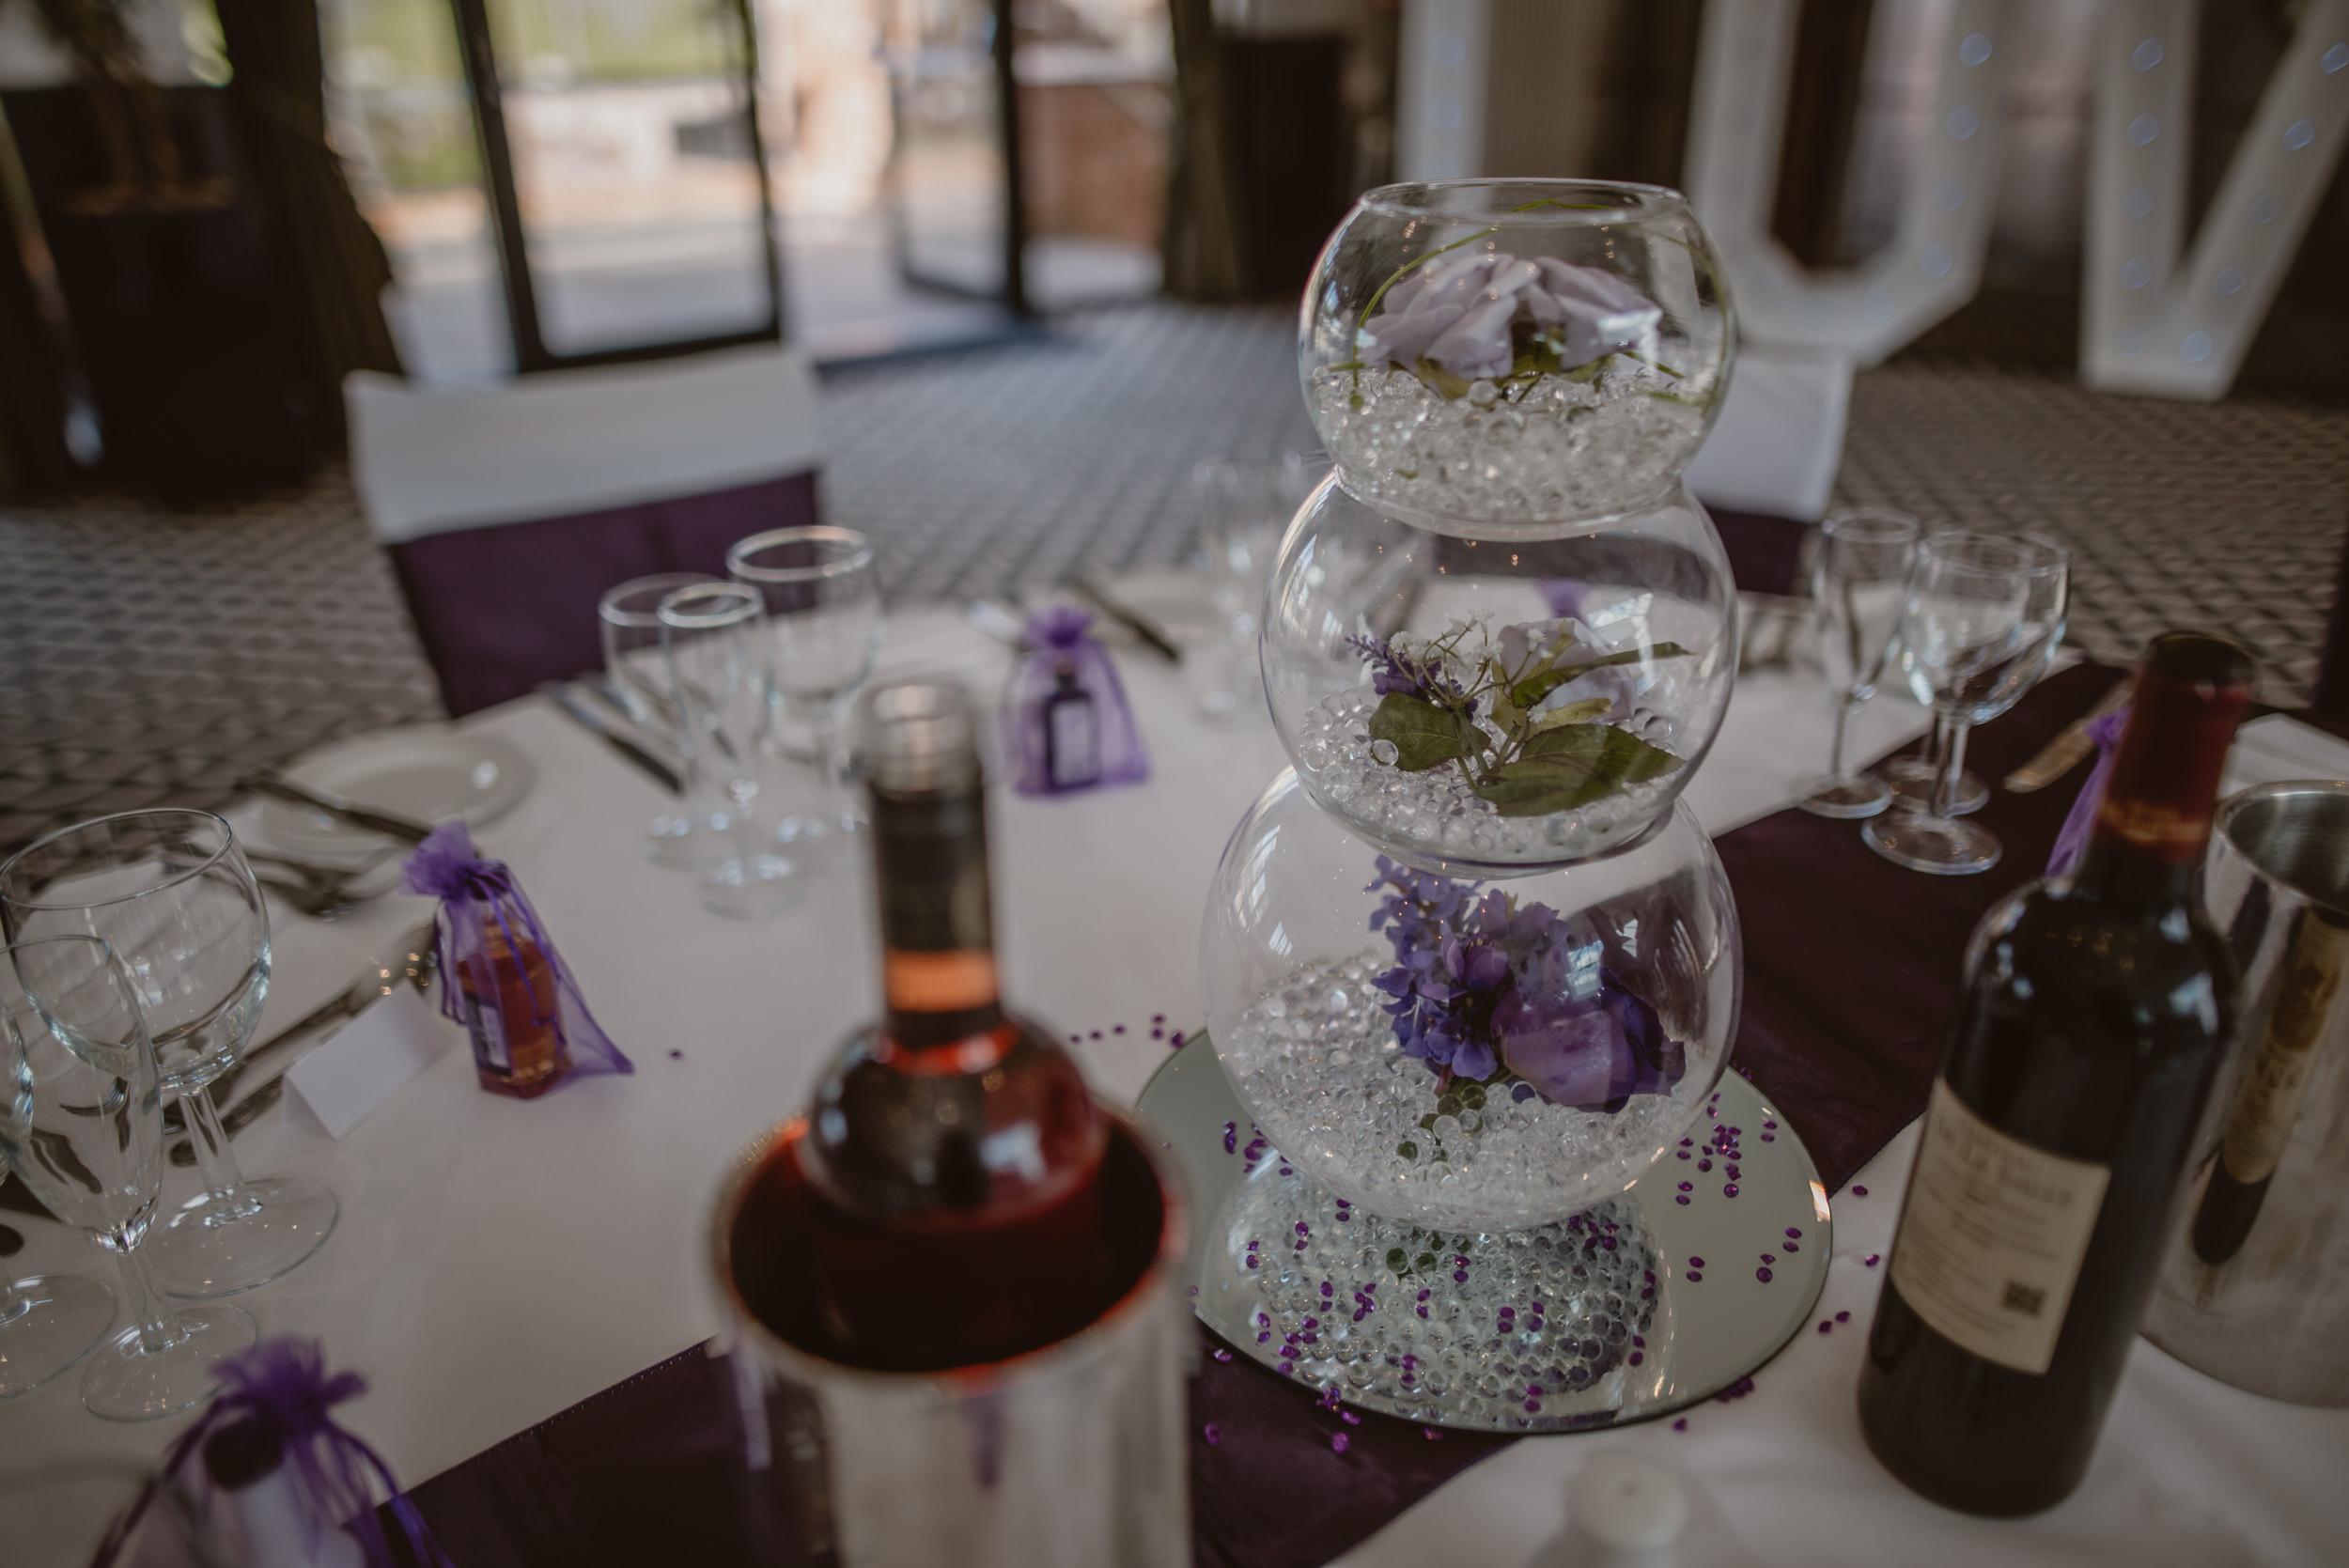 Chantelle-and-Stephen-Old-Thorns-Hotel-Wedding-Liphook-Manu-Mendoza-Wedding-Photography-325.jpg